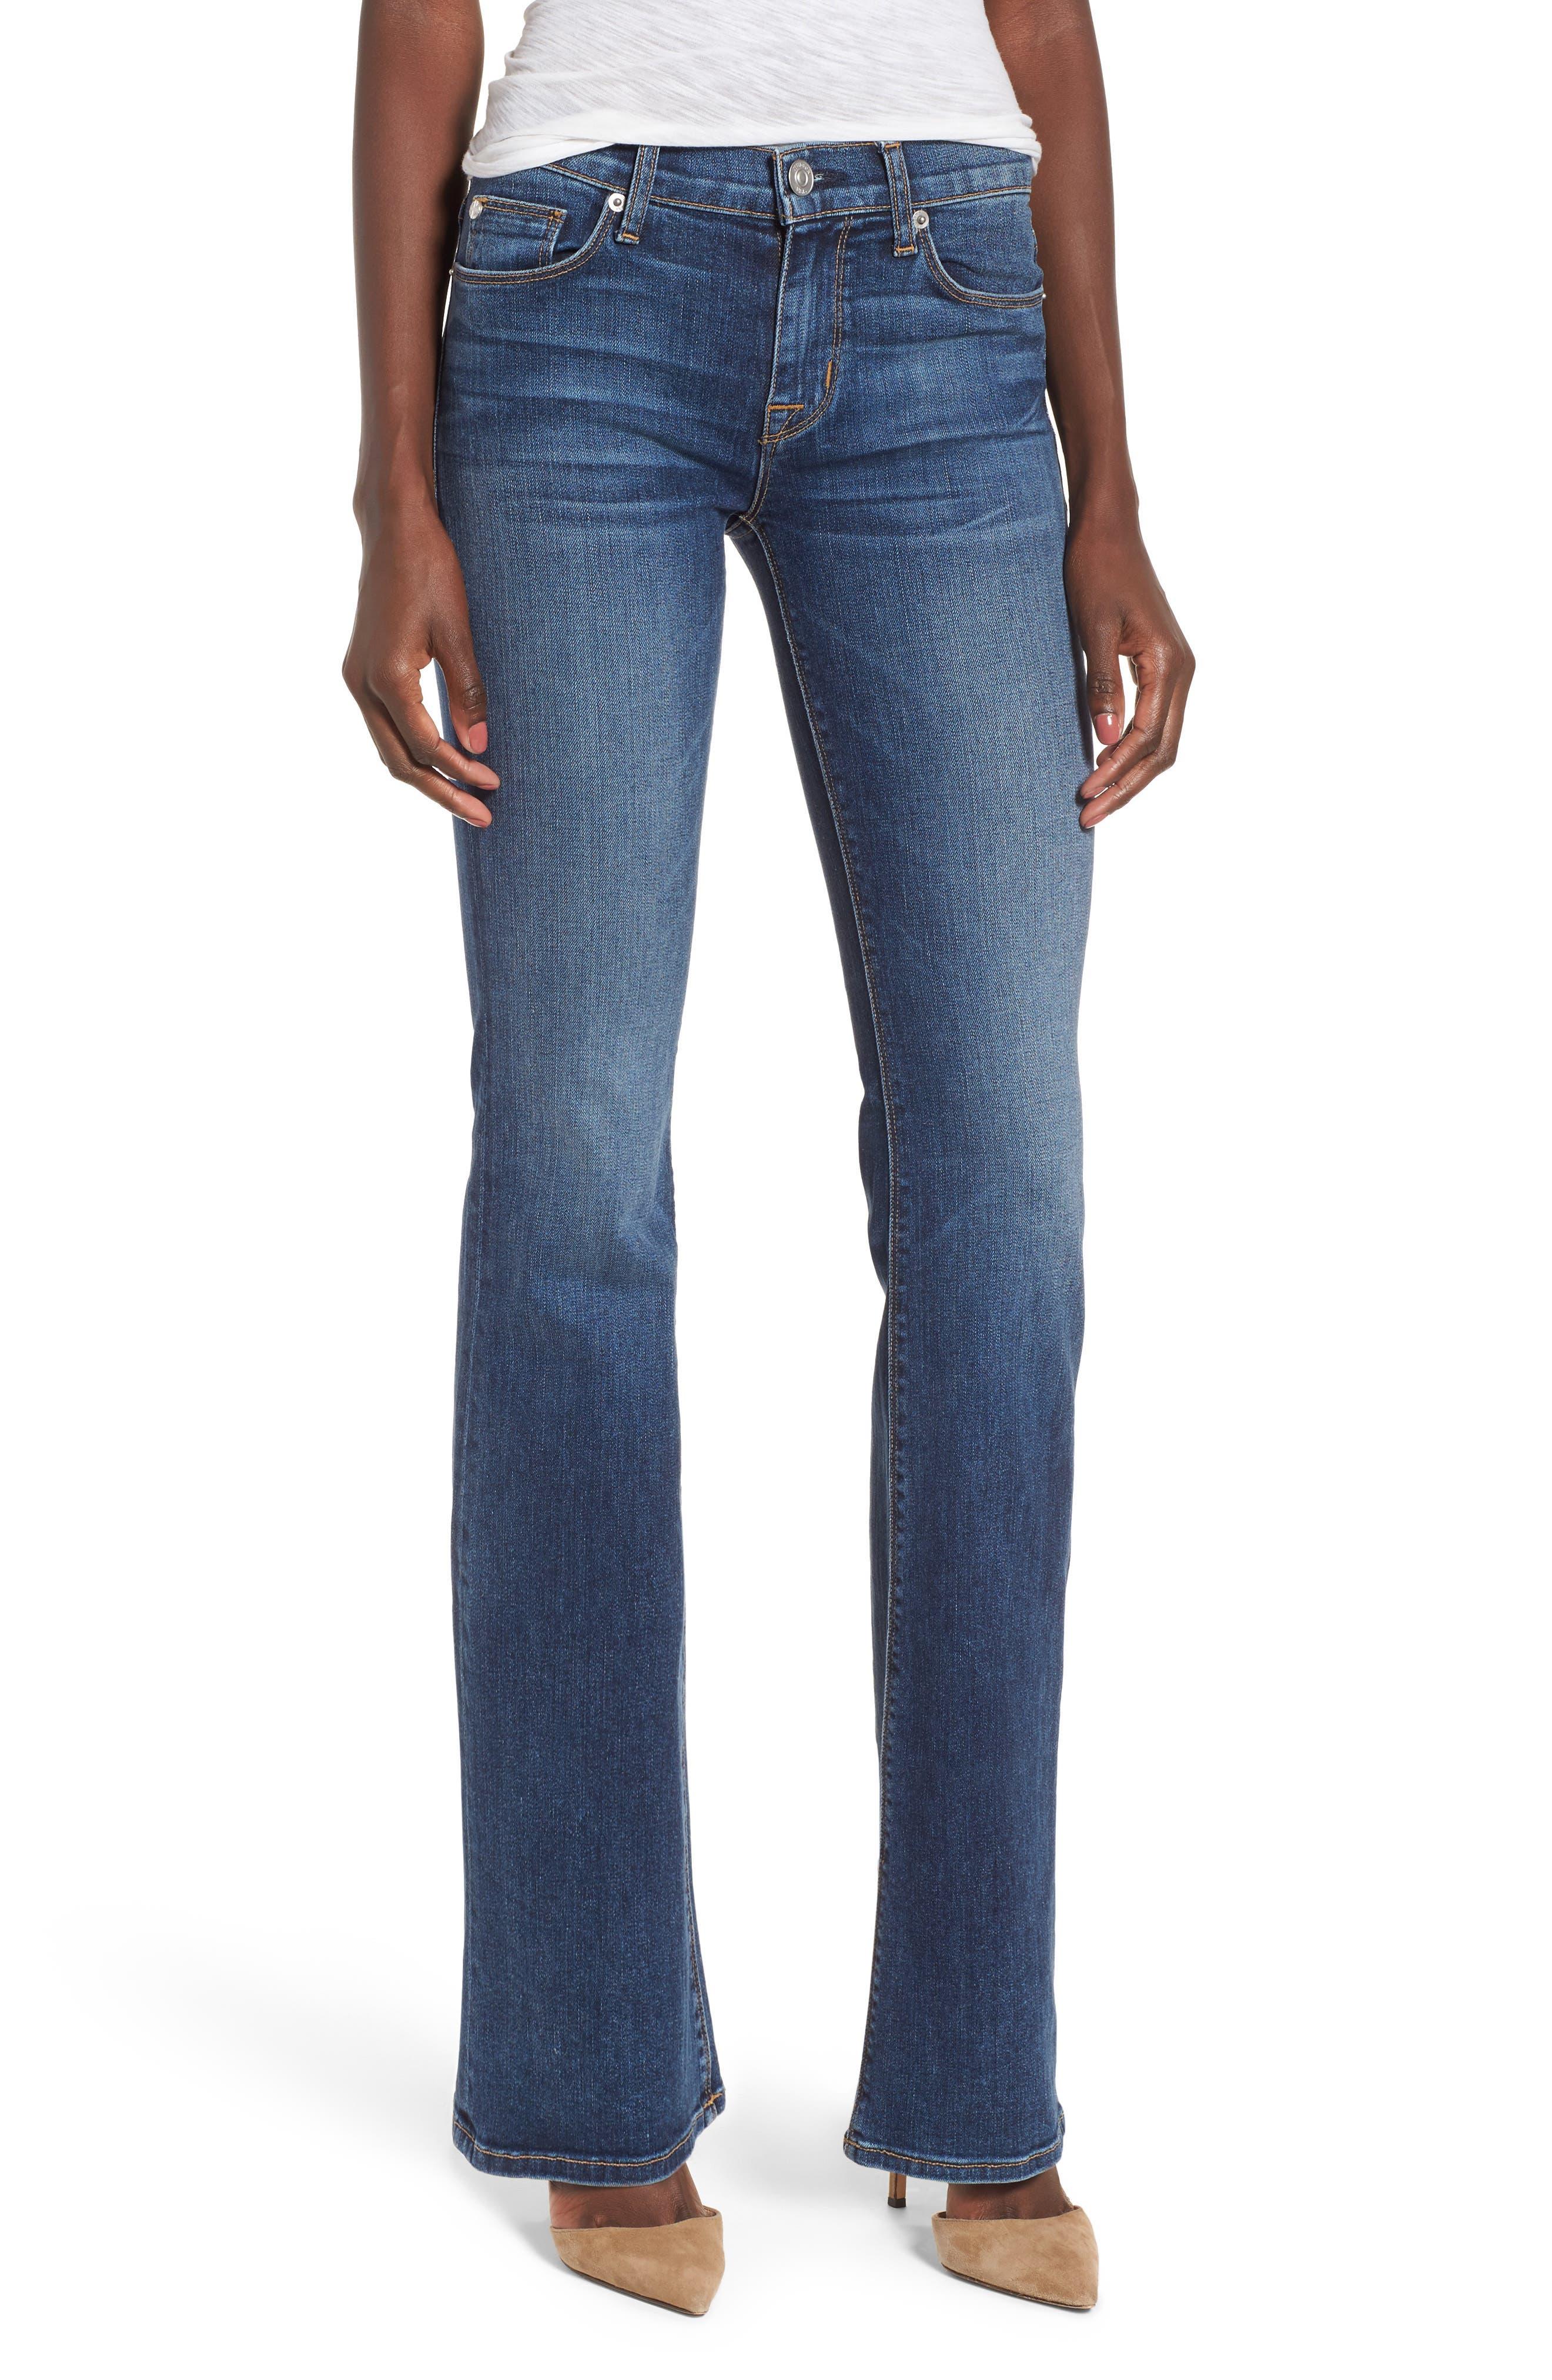 Drew Bootcut Jeans,                             Main thumbnail 1, color,                             UNFAMED